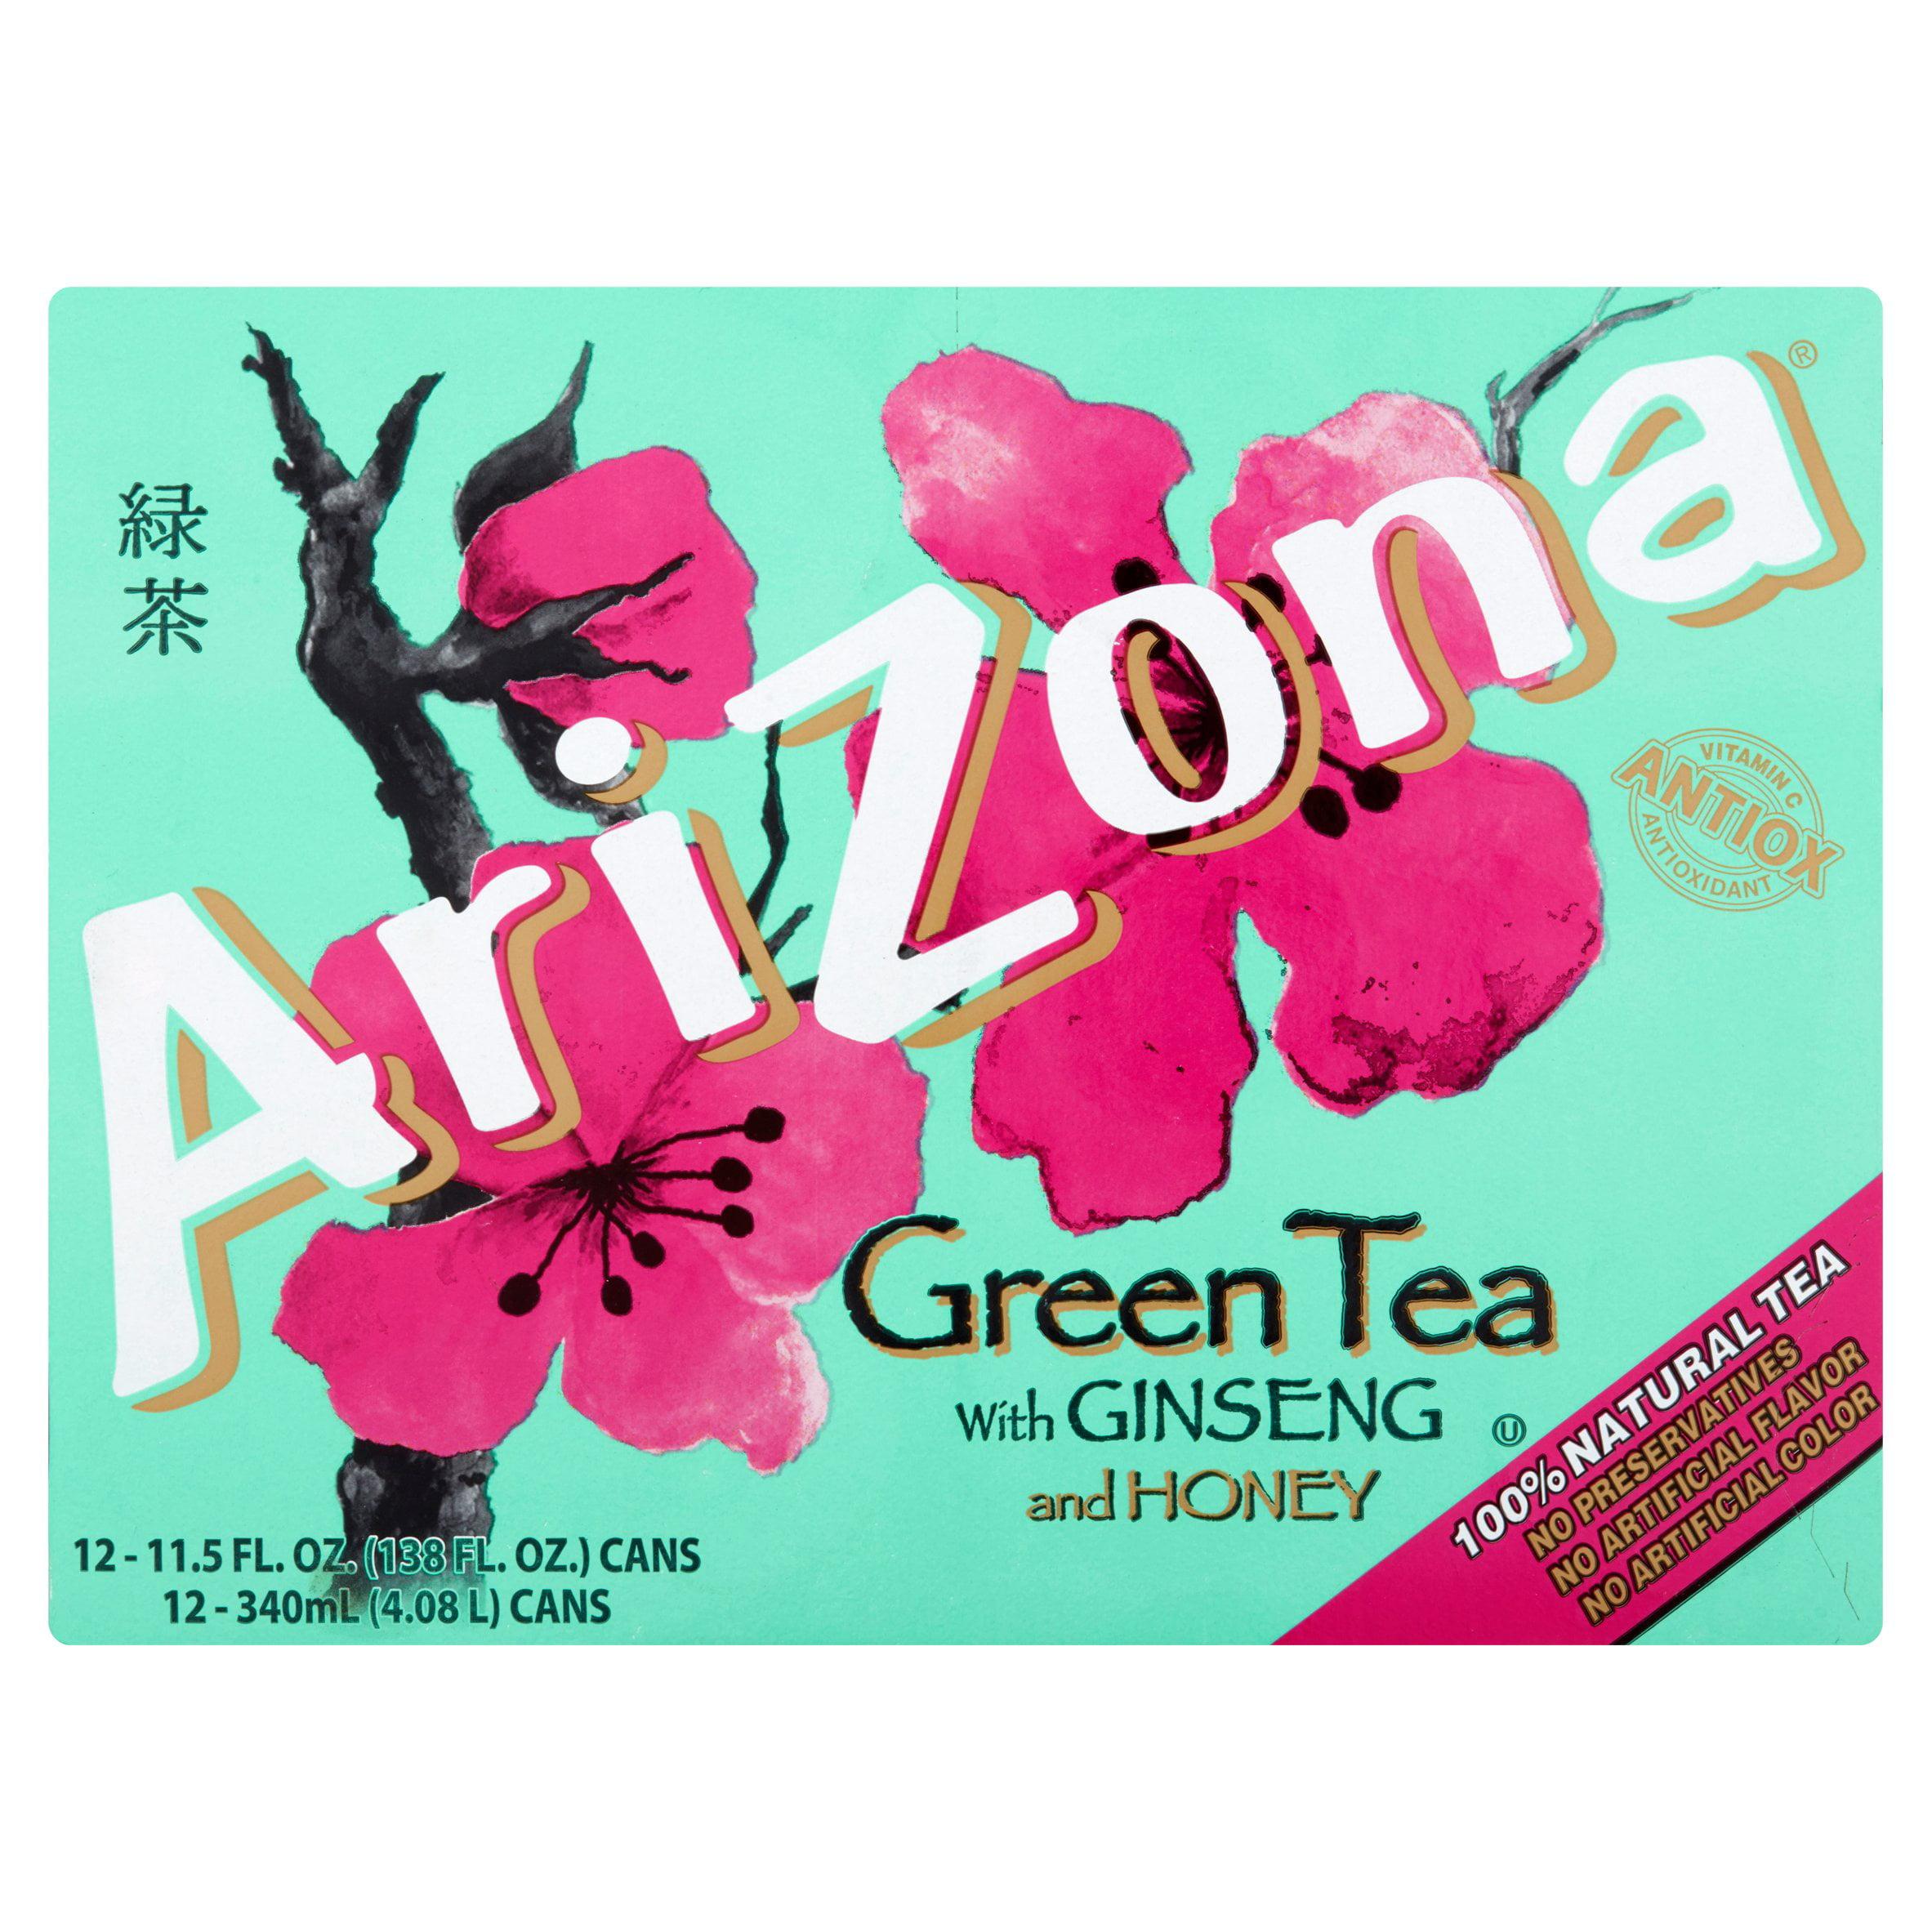 AriZona Green Tea With Ginseng And Honey 12 PK, 11.5 FL OZ by Arizona Beverages USA LLC